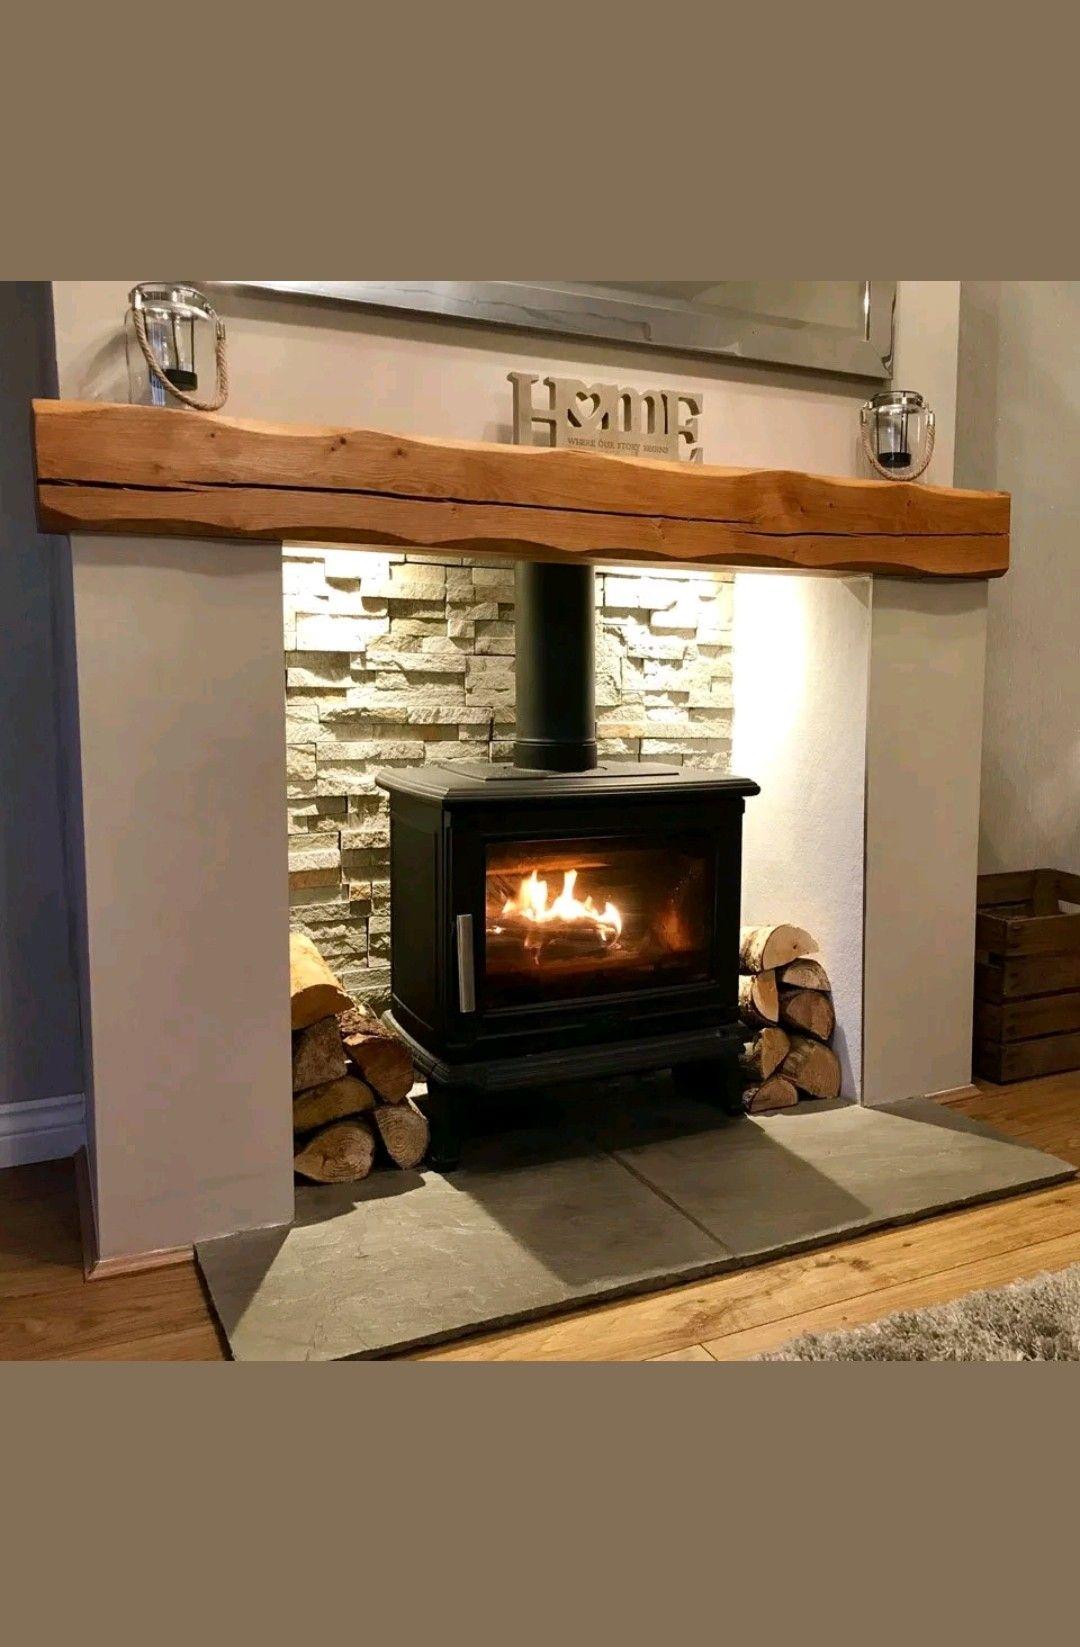 Pin by Josh Palmore on Fireplaces Brick fireplace, Home